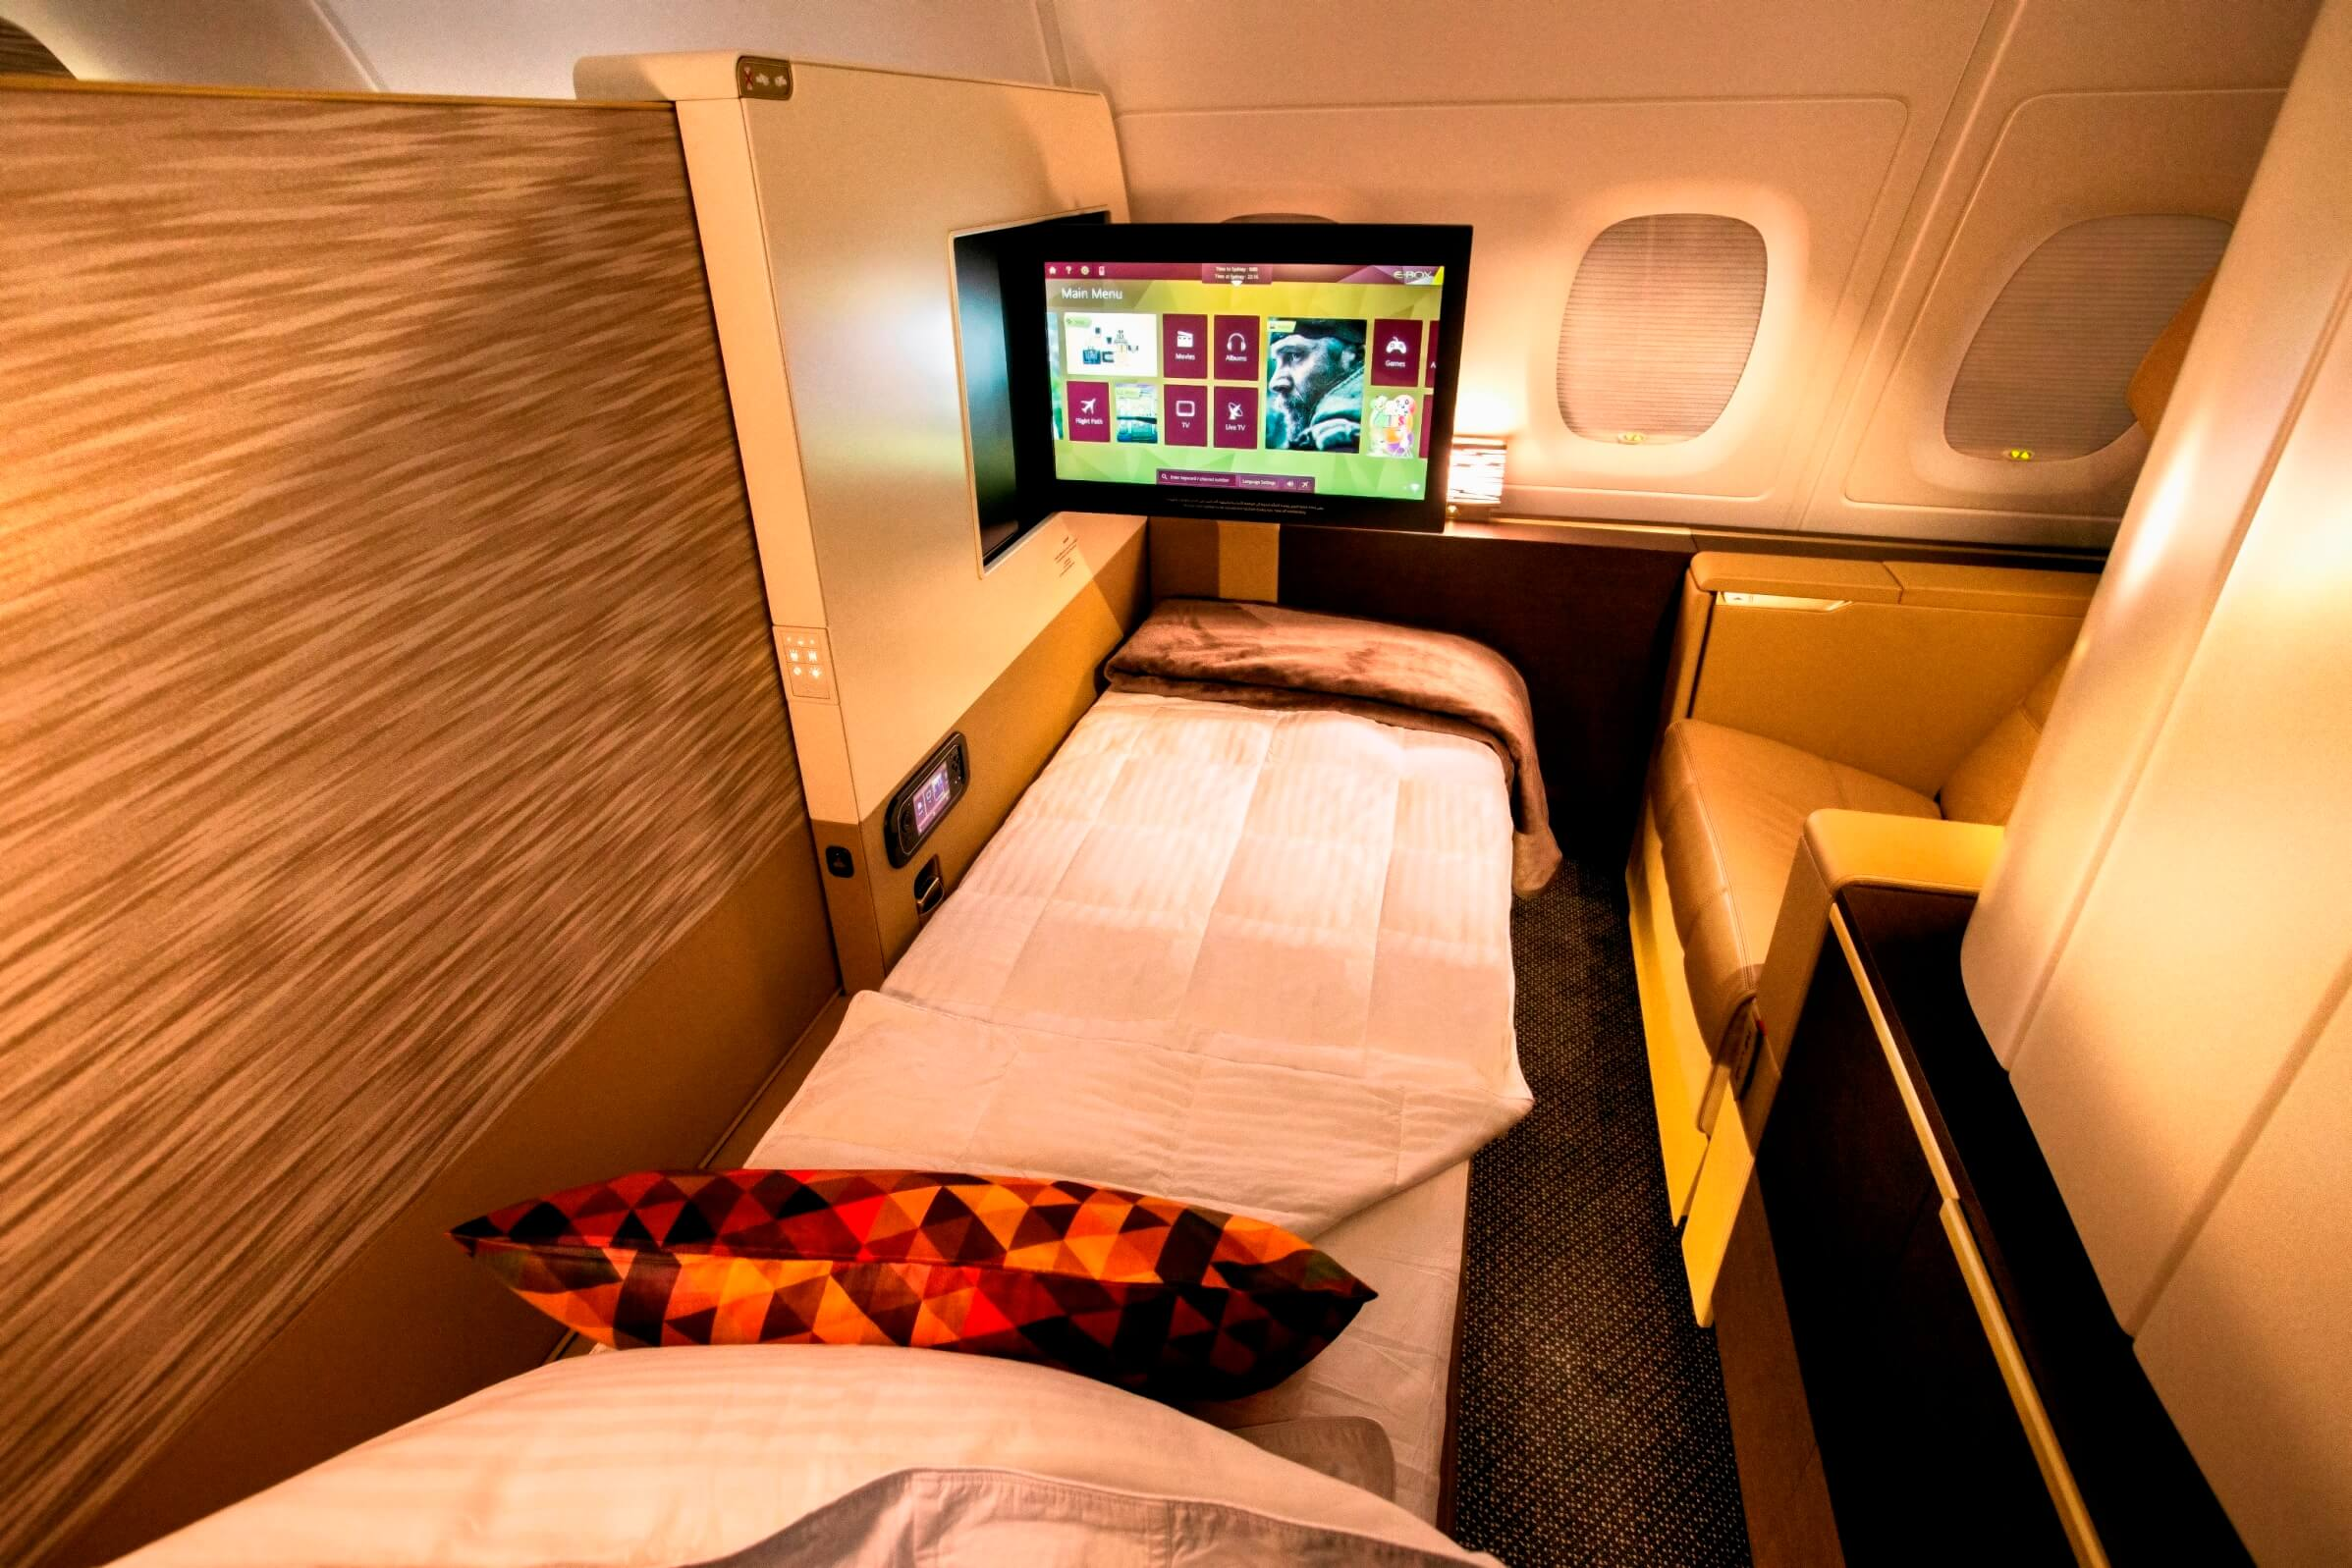 Poltrona First Class.Skytrax Hat Trick For Etihad Airways First Class Melissa Hoyer